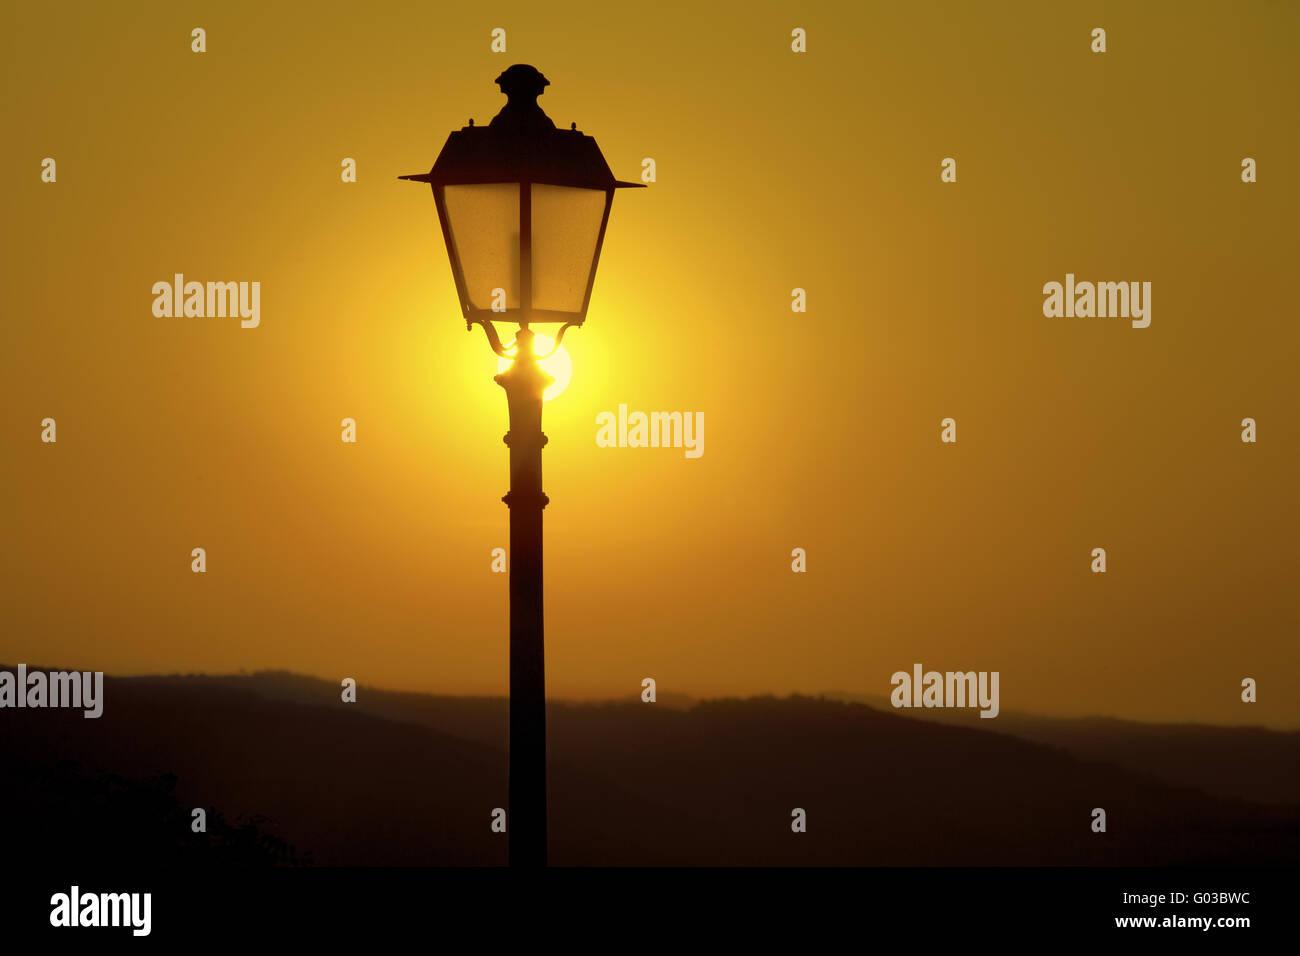 street lantern and sunset, Radda in Chianti, Italy - Stock Image